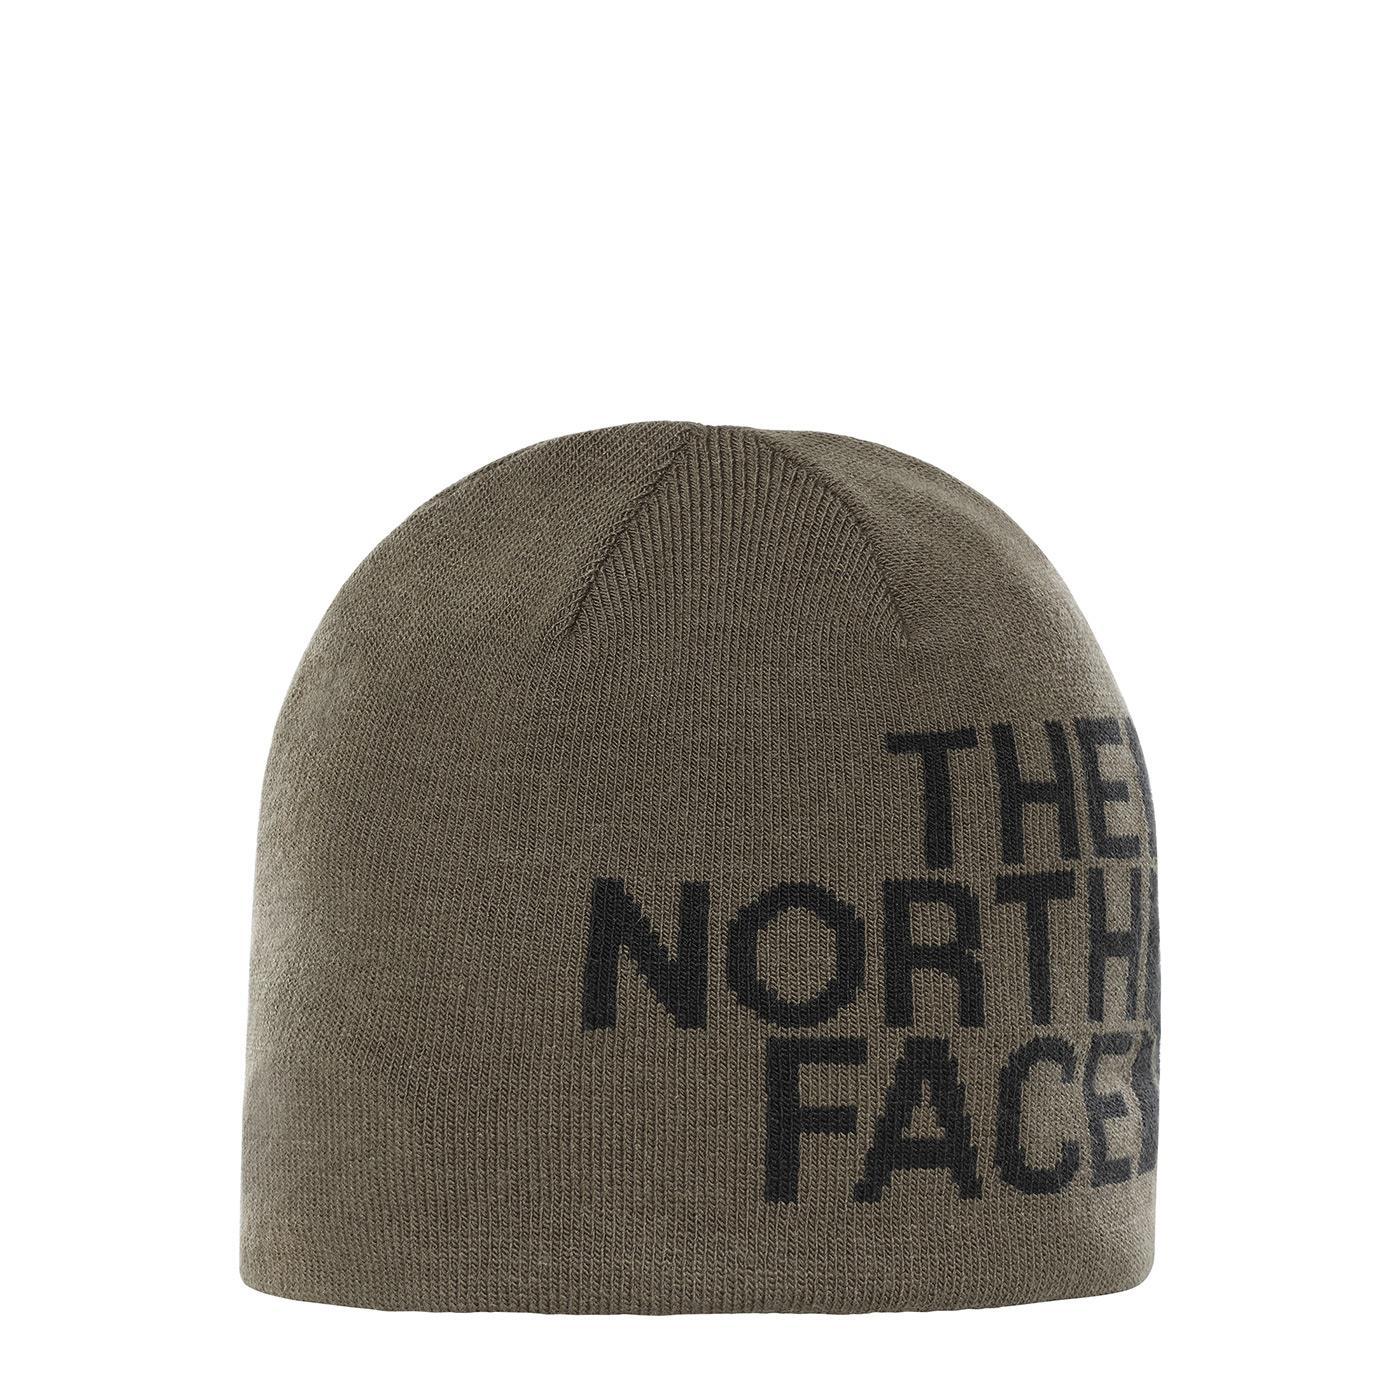 The Northface RVSBL TNF BANNER Bere NF00AKNDBQW1